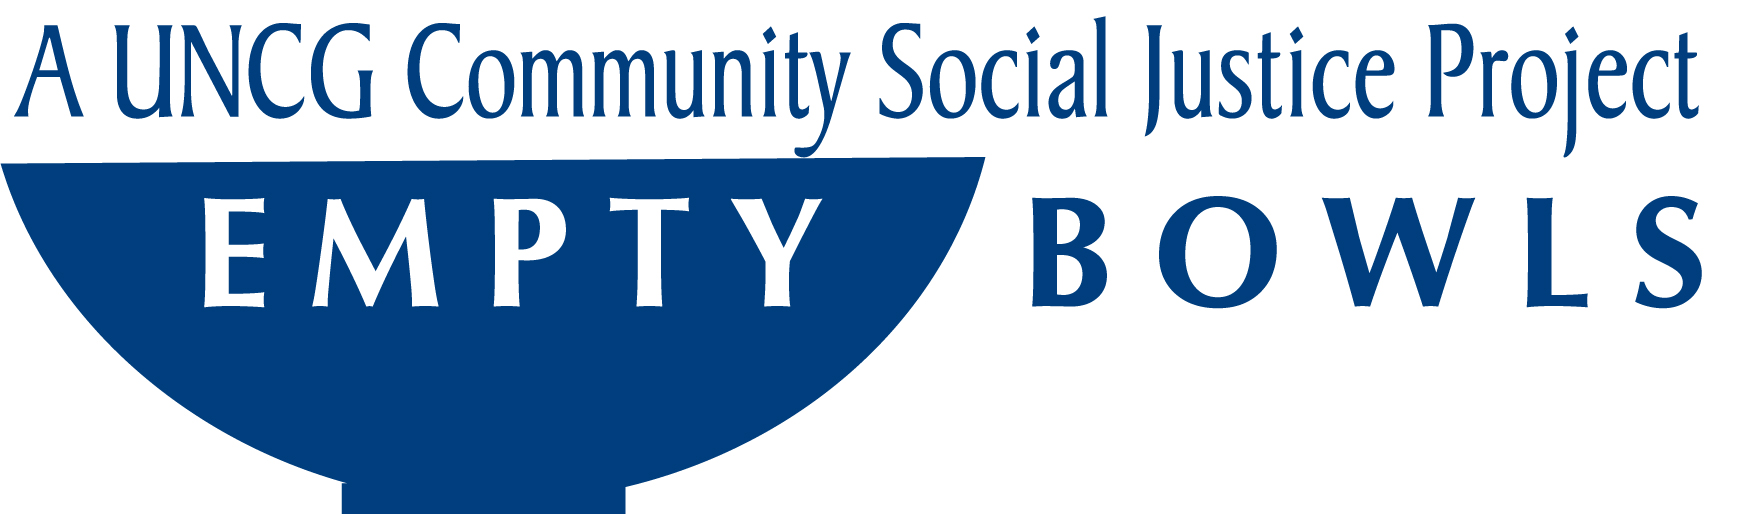 A UNCG Community Social Justice Project: Empty Bowls